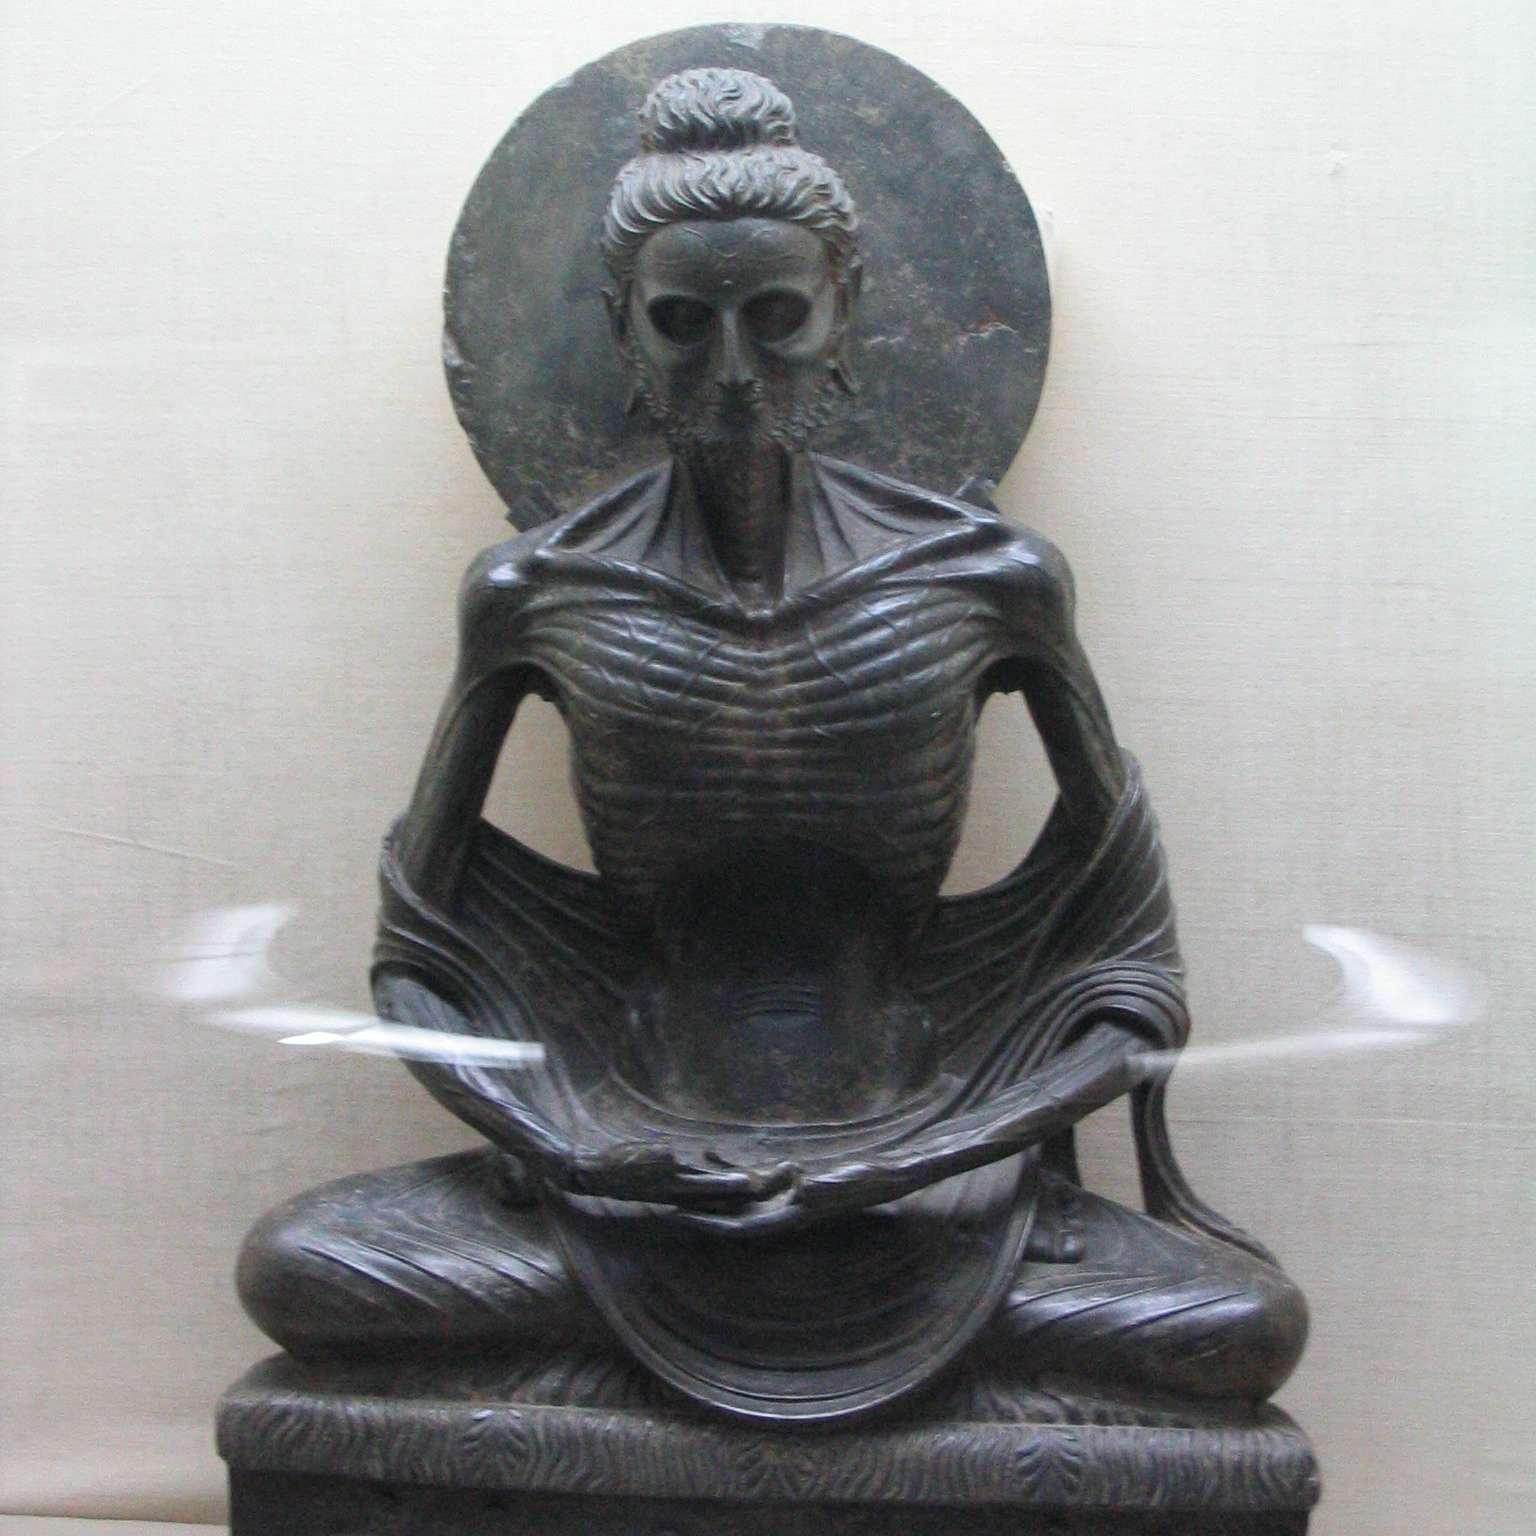 Fasting buddha at lahore museum